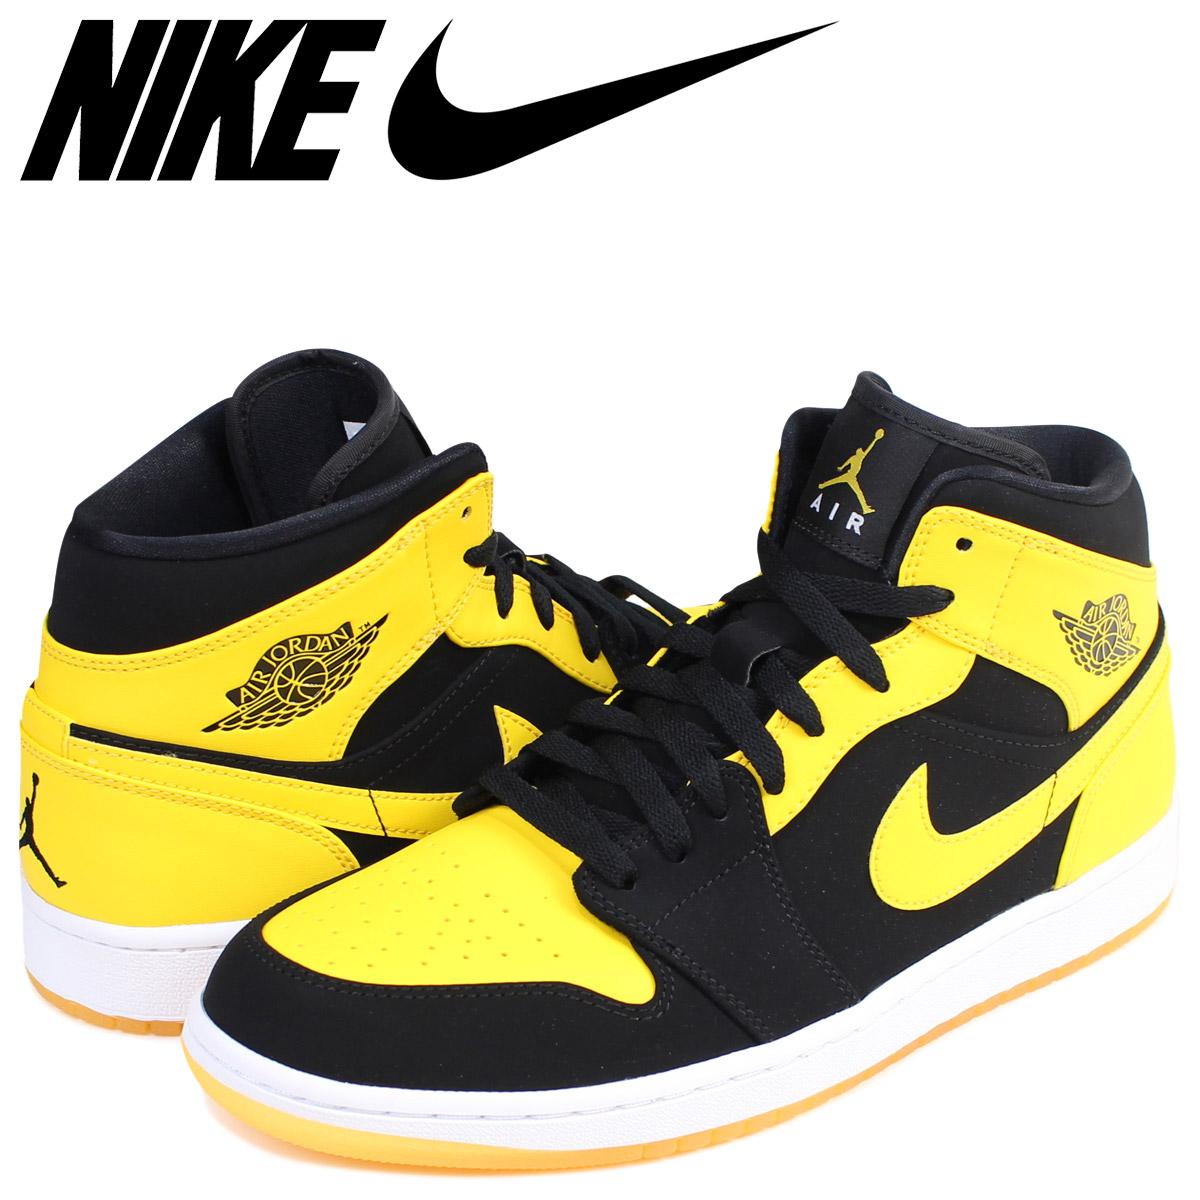 724 035 Mid Shoes Jordan Black 554 Men Air 1 Nike Sneakers 0Nwv8mnO